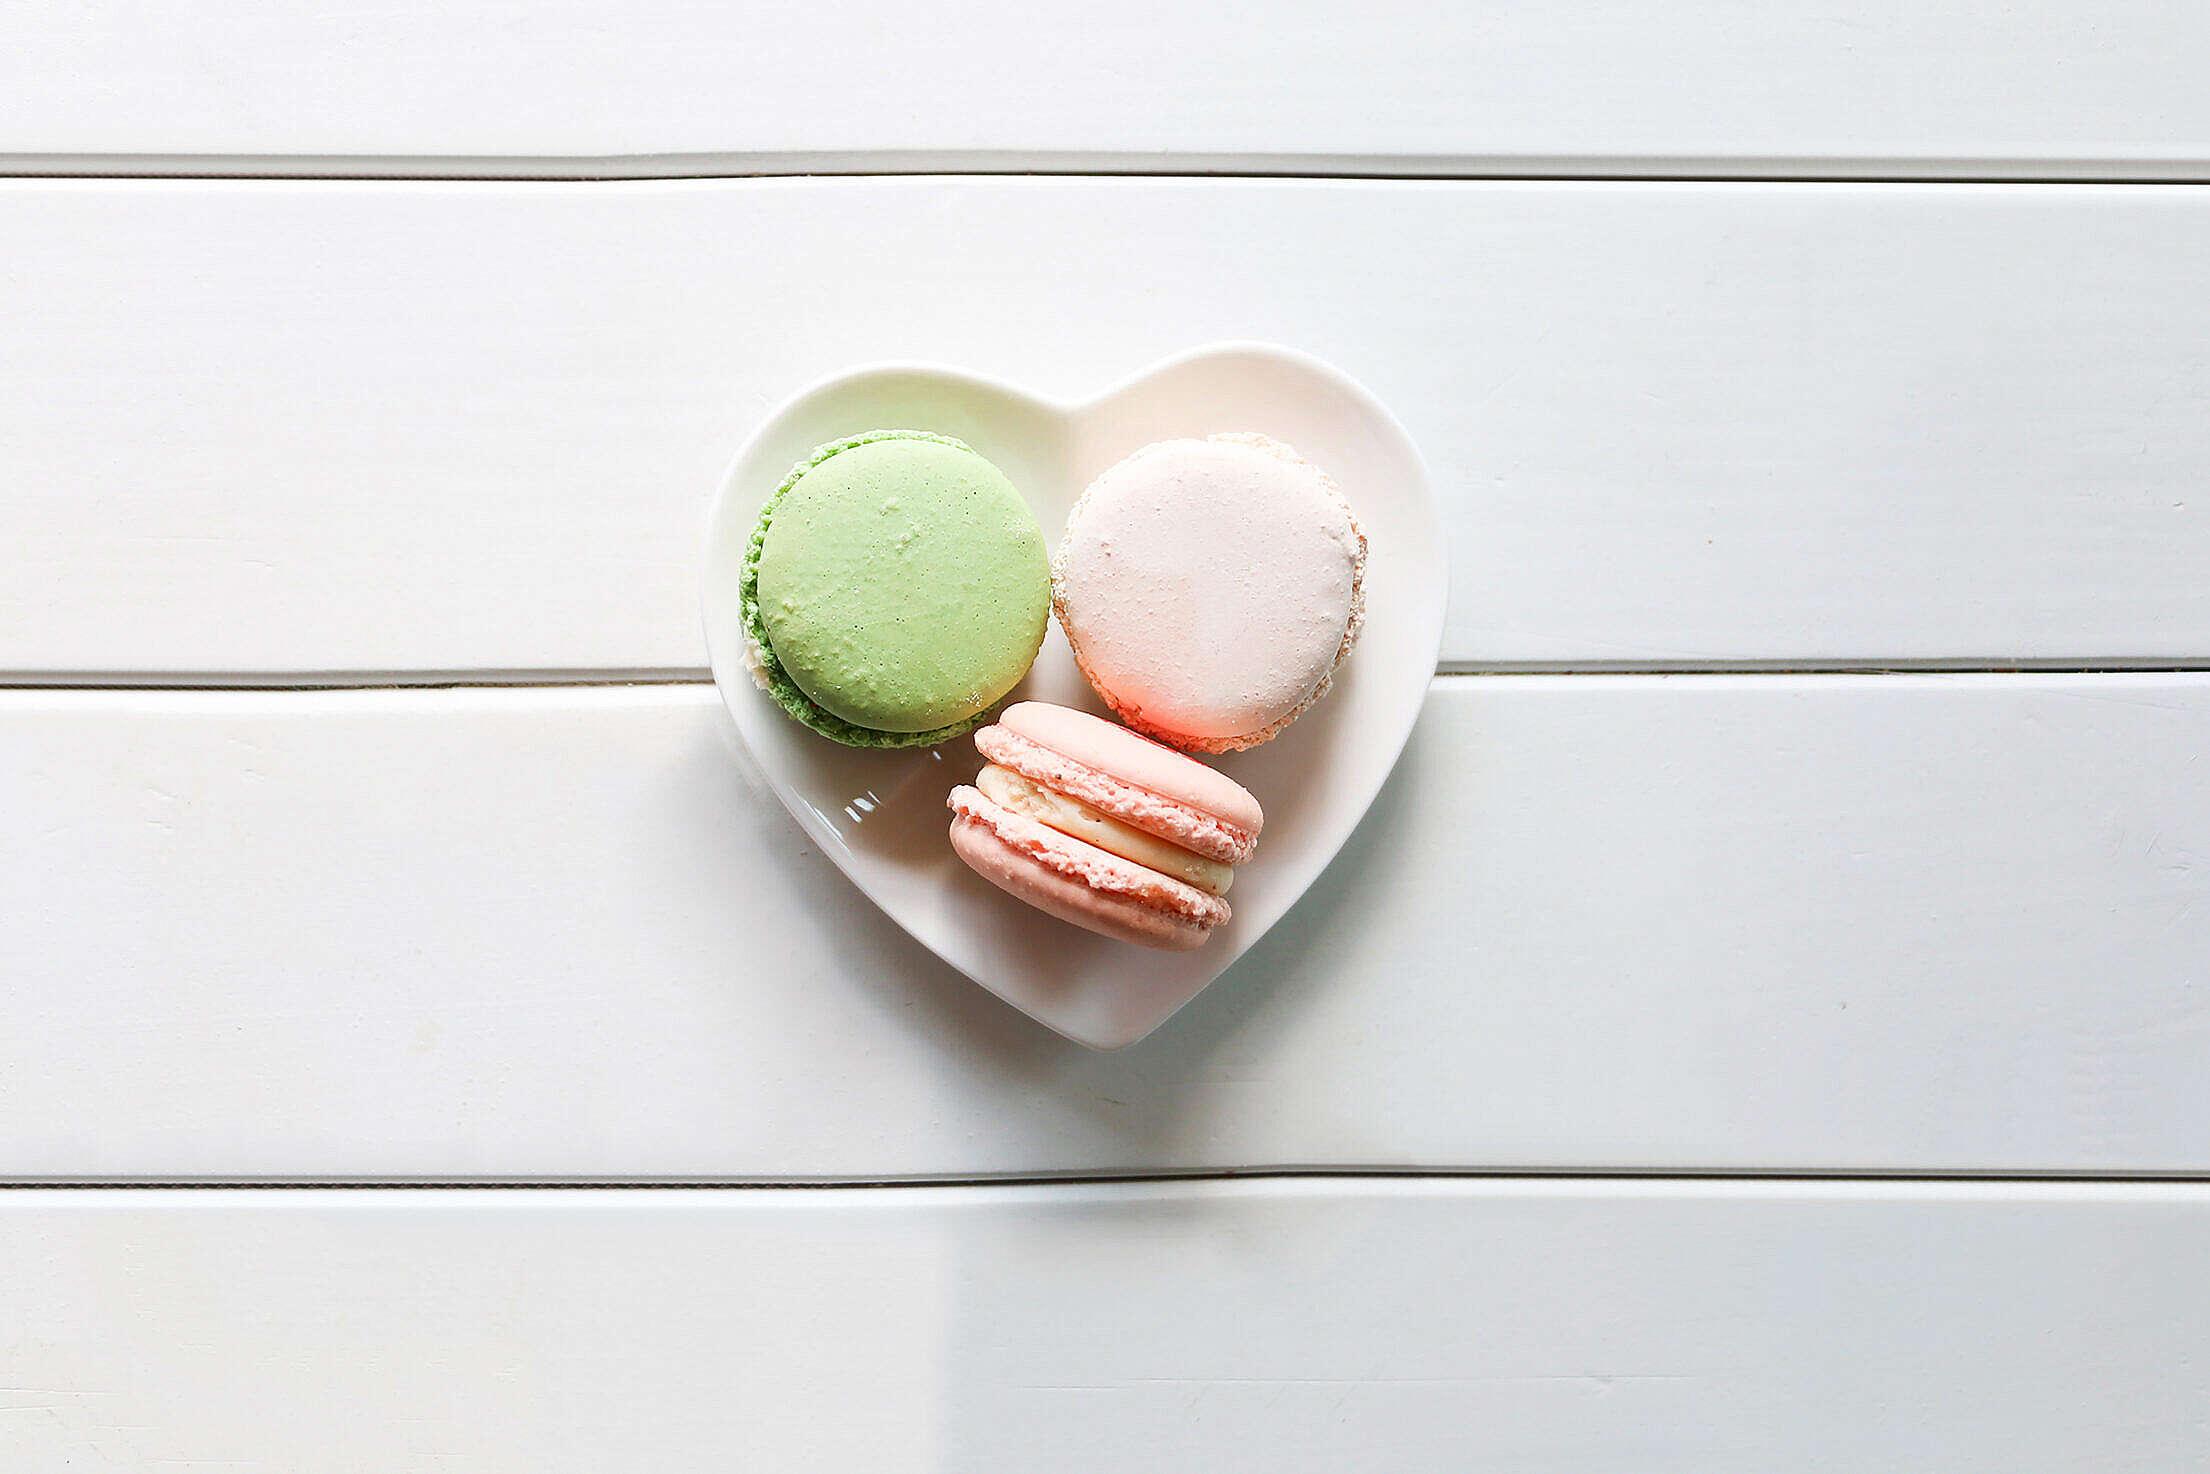 Sweet Macarons on a Heart-Shaped Plate Free Stock Photo